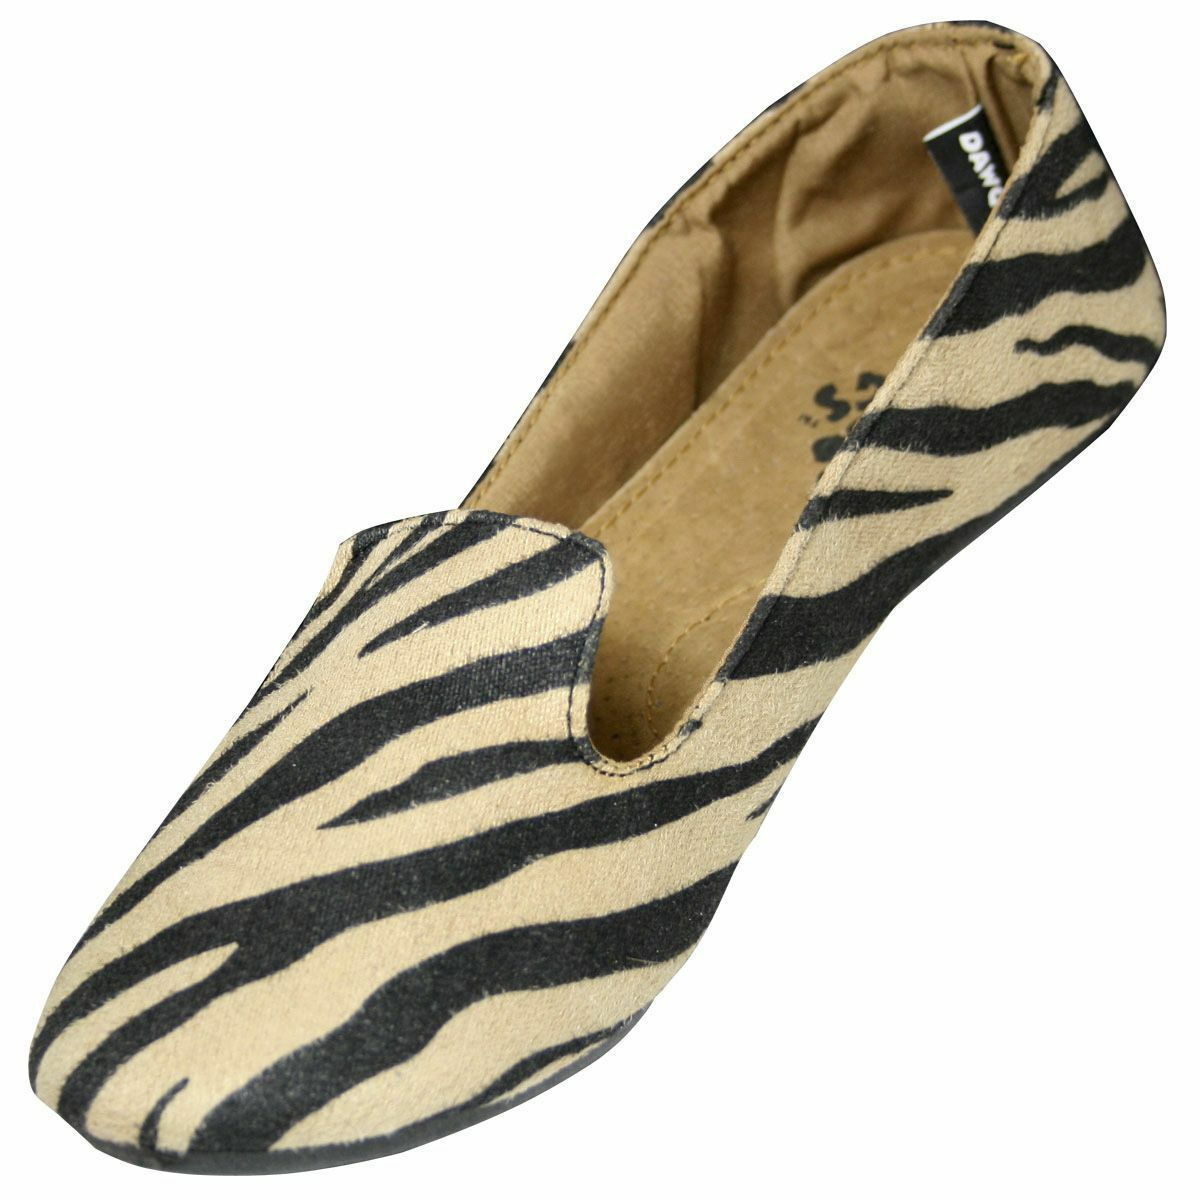 Women's Dawgs Kaymann Exotic Smoking Loafer Safari Size 9  NBIO0-M9